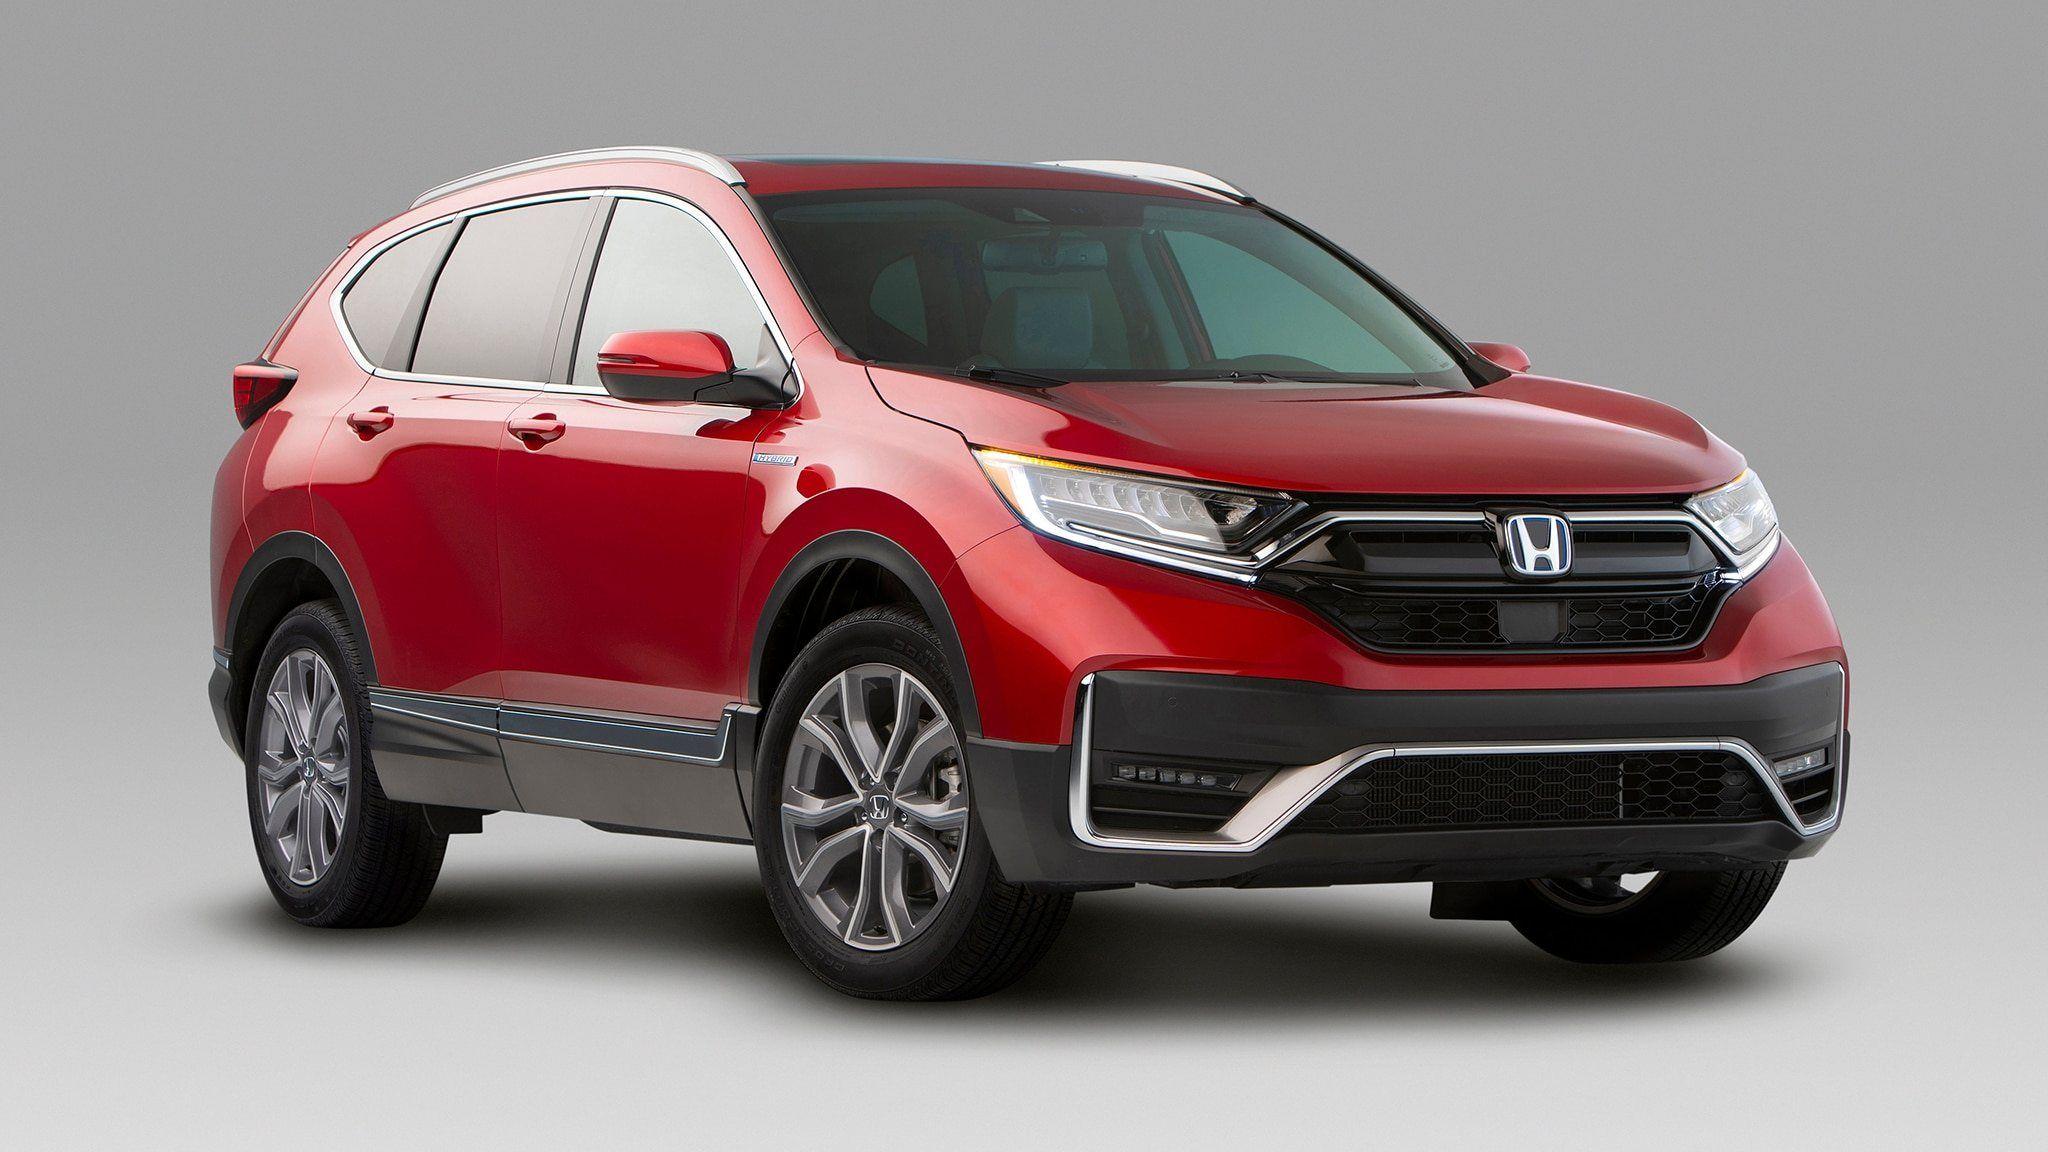 2021 Honda Accord Hybrid First Drive In 2020 Honda Crv Honda Crv Touring Honda Crv Hybrid